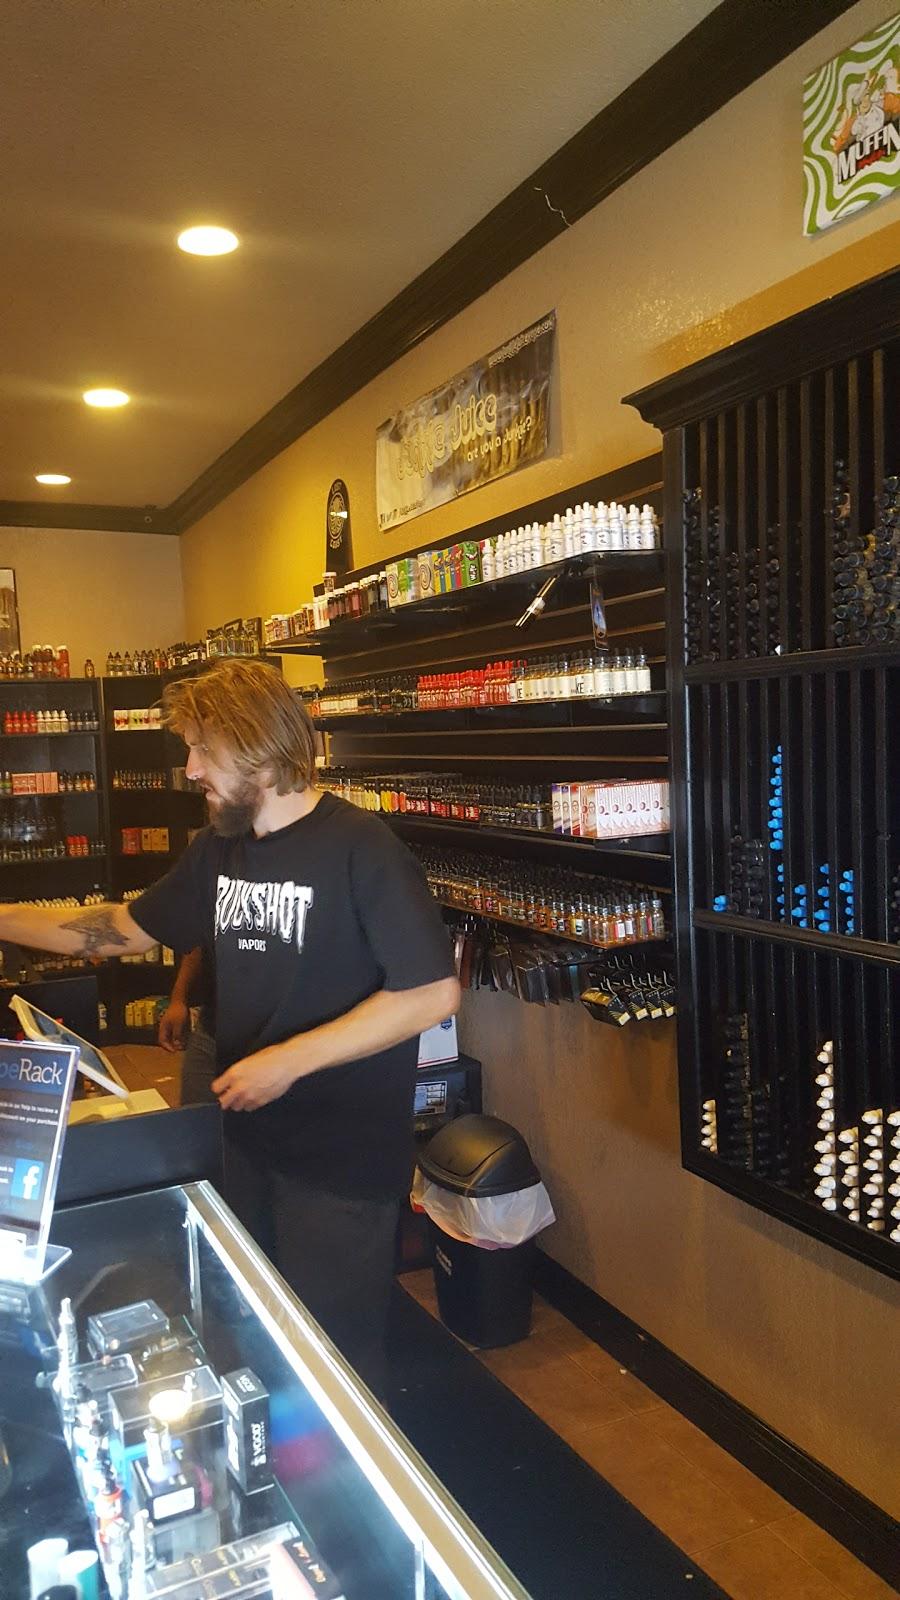 VapeRack - store  | Photo 1 of 10 | Address: 15028 Imperial Hwy, La Mirada, CA 90638, USA | Phone: (562) 941-8273